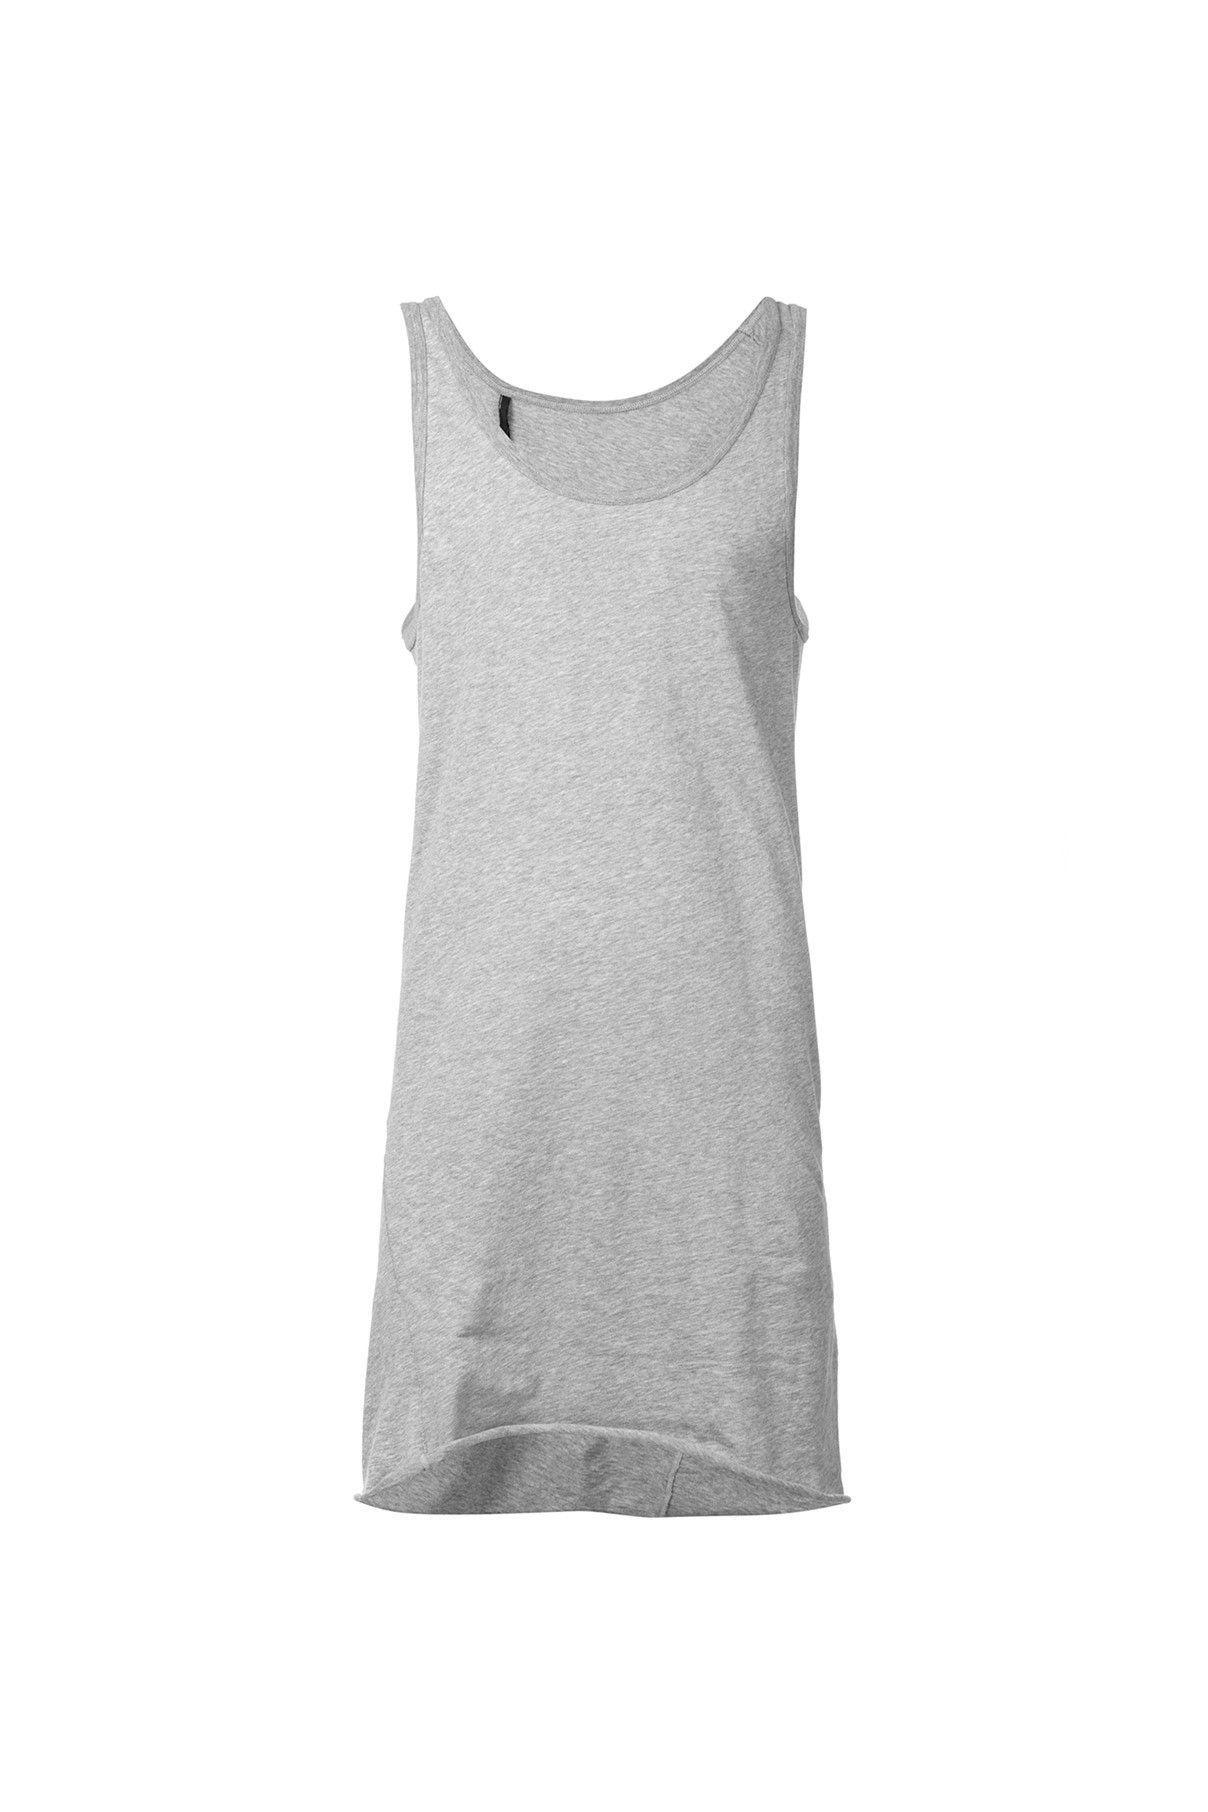 {11 By Boris Bidjan Saberi / 01 clothing / 04 knitwear / 02 tank top} Block Print Tank Top